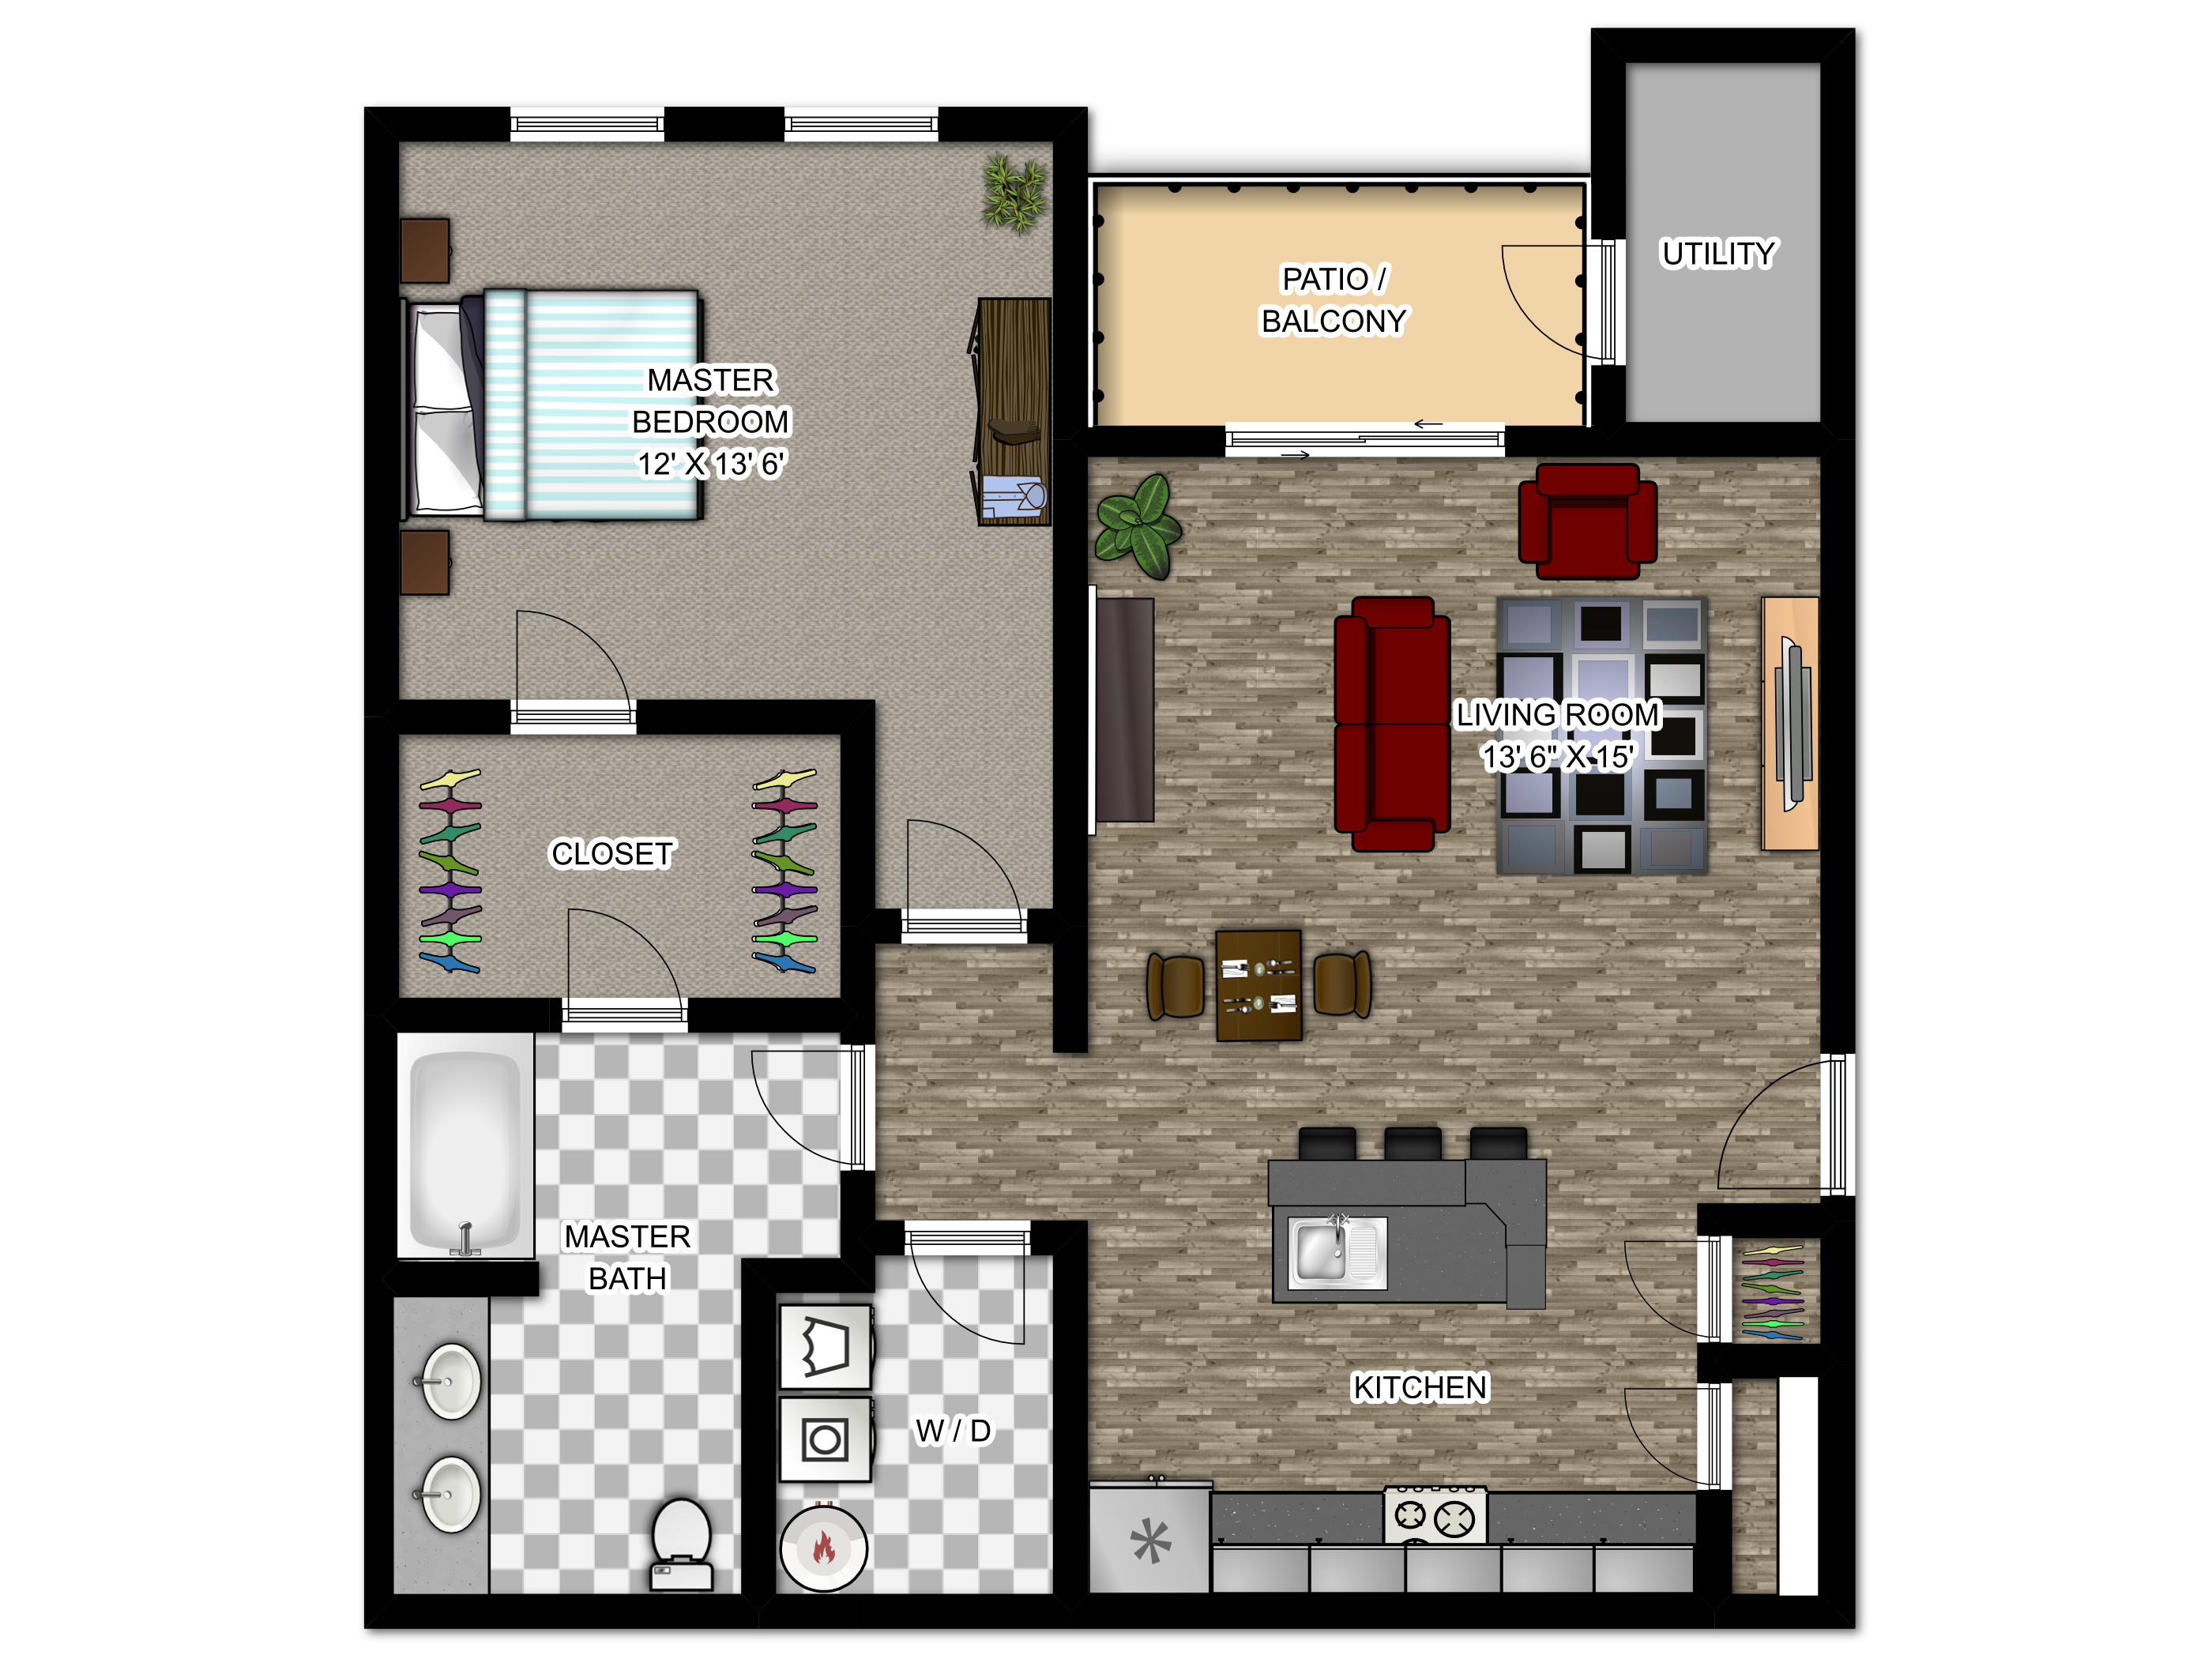 Meadowood Apartments Floor Plans - The Napa